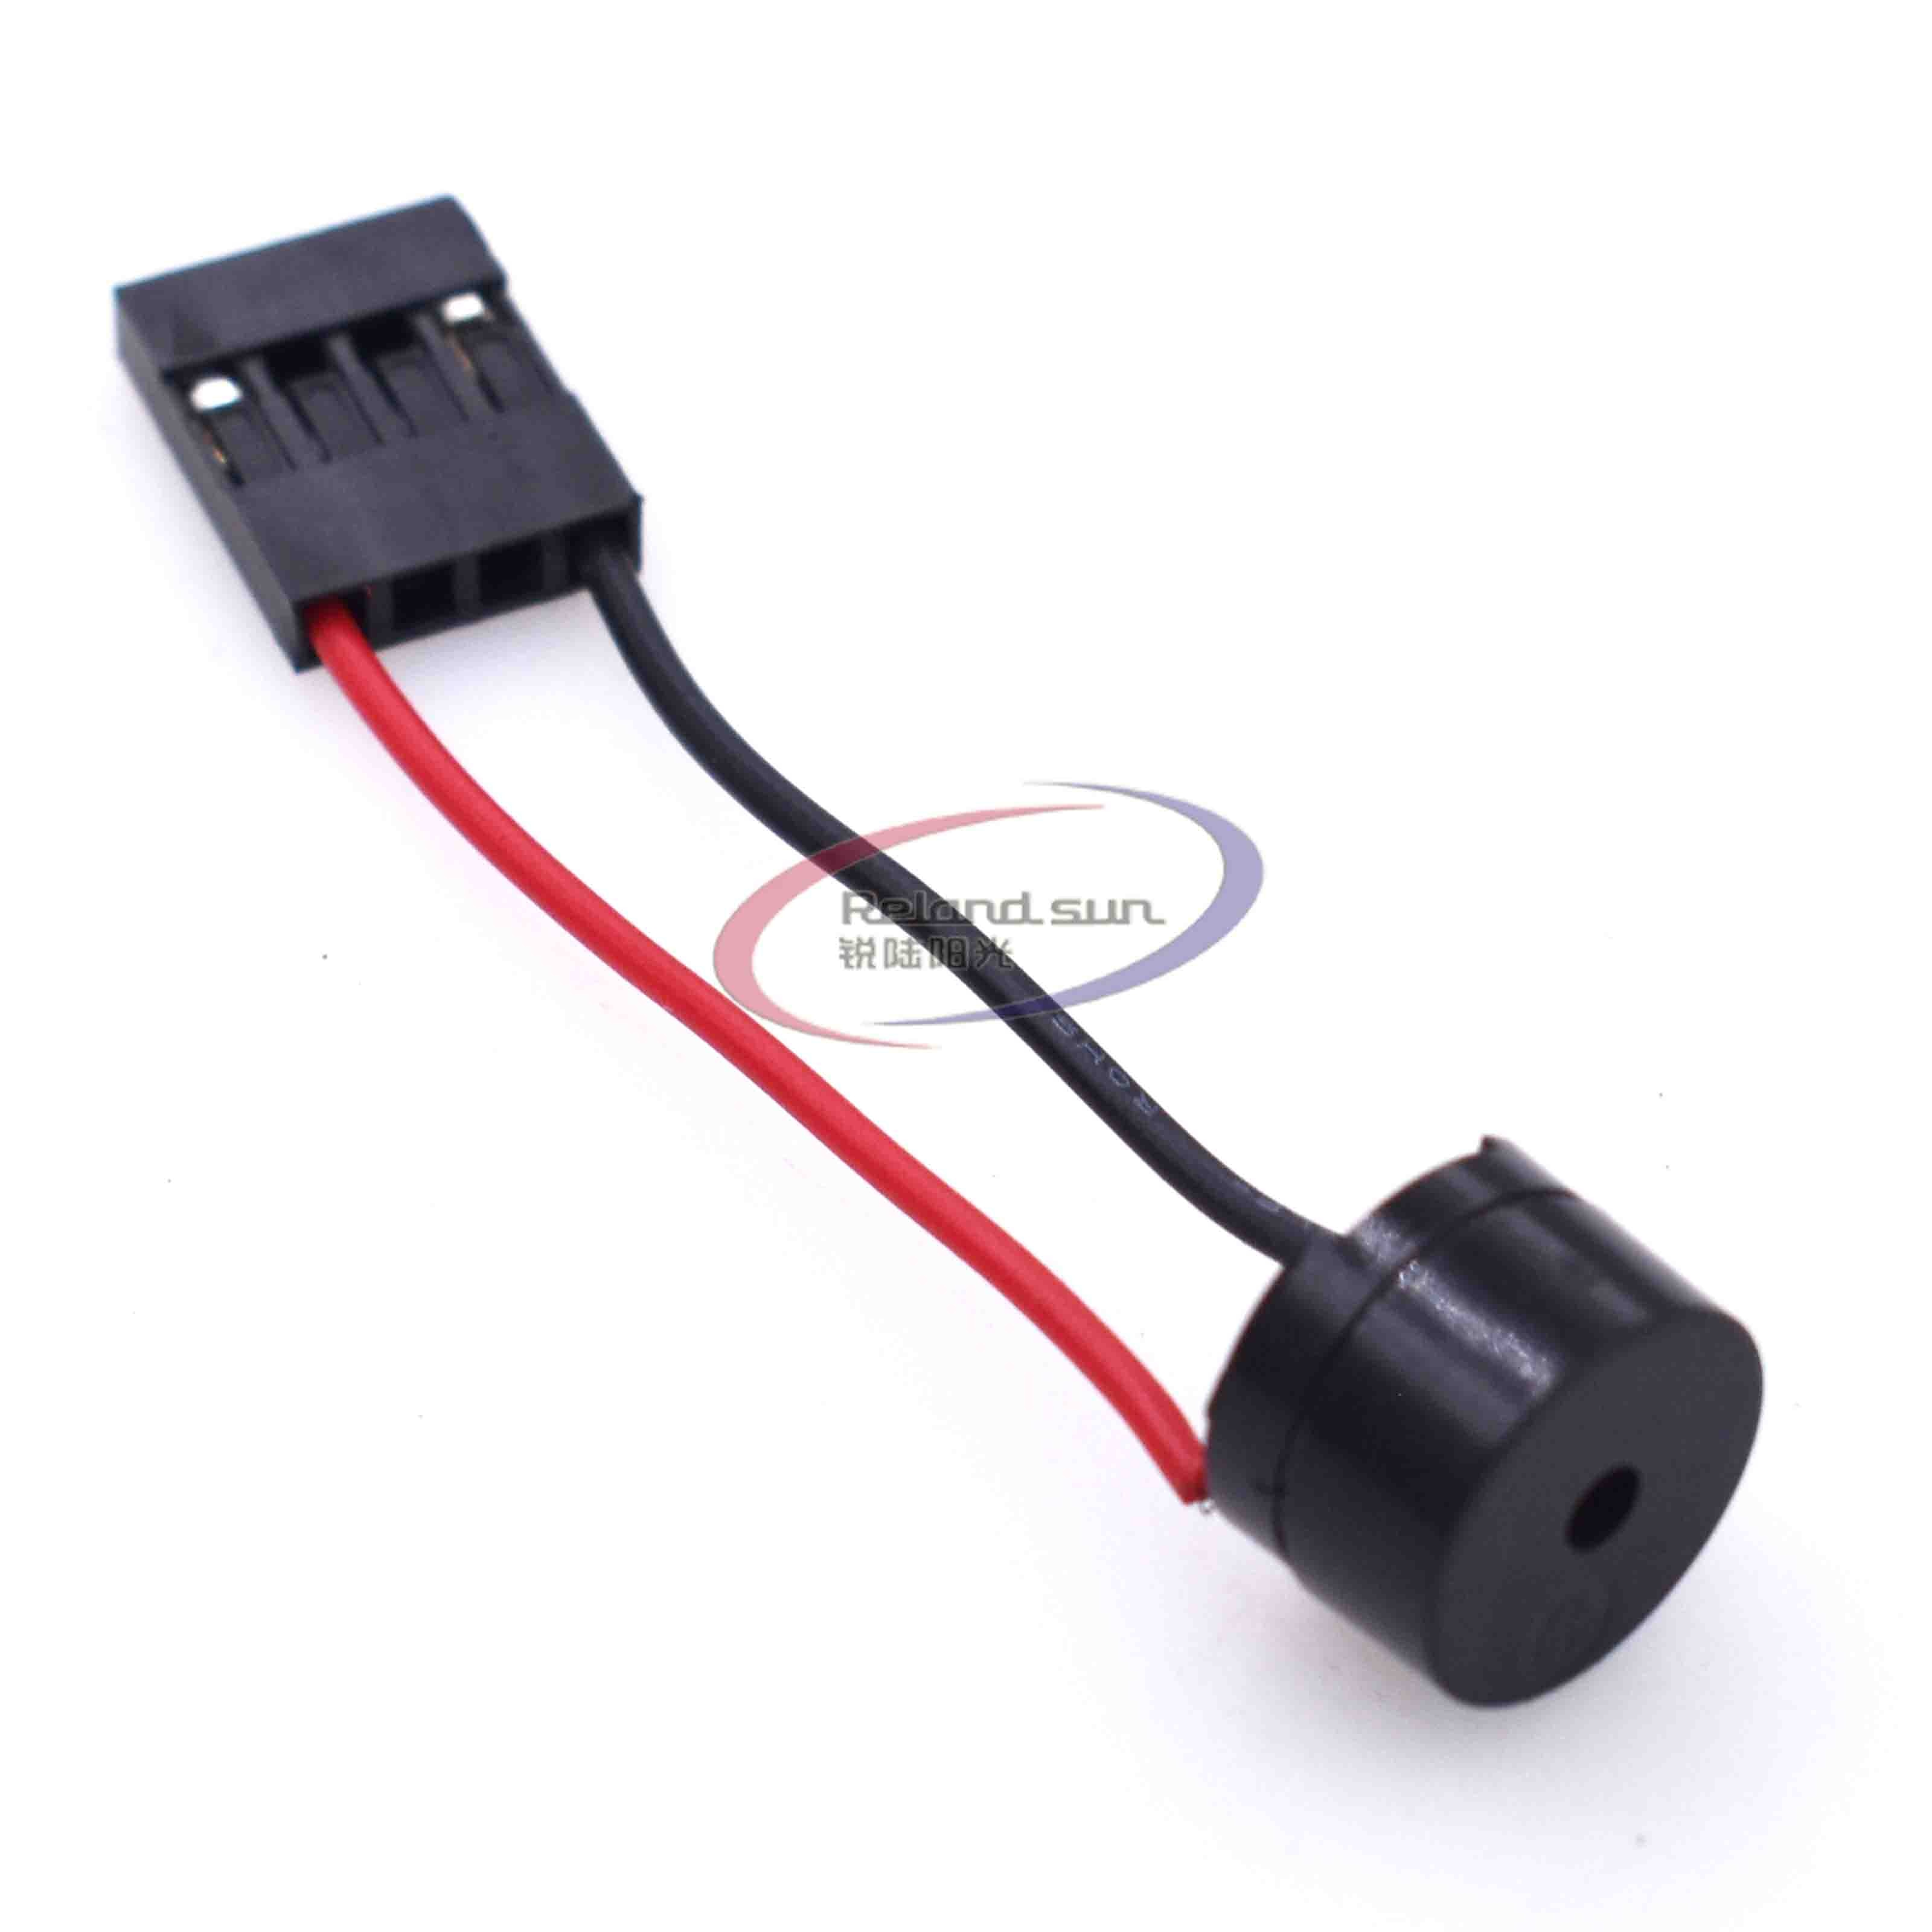 10 piezas Mini altavoz de enchufe para PC Interanal BIOS ordenador placa madre Mini caja a bordo zumbador Junta alarma bip